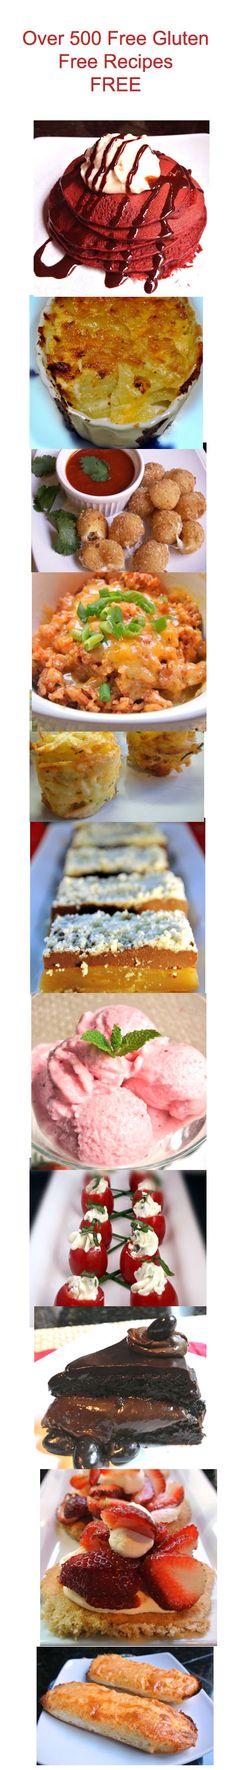 627 Free Gluten Free Recipes at http://www.momwhatsfordinnerblog.com #glutenfree #recipe #easy #recipes